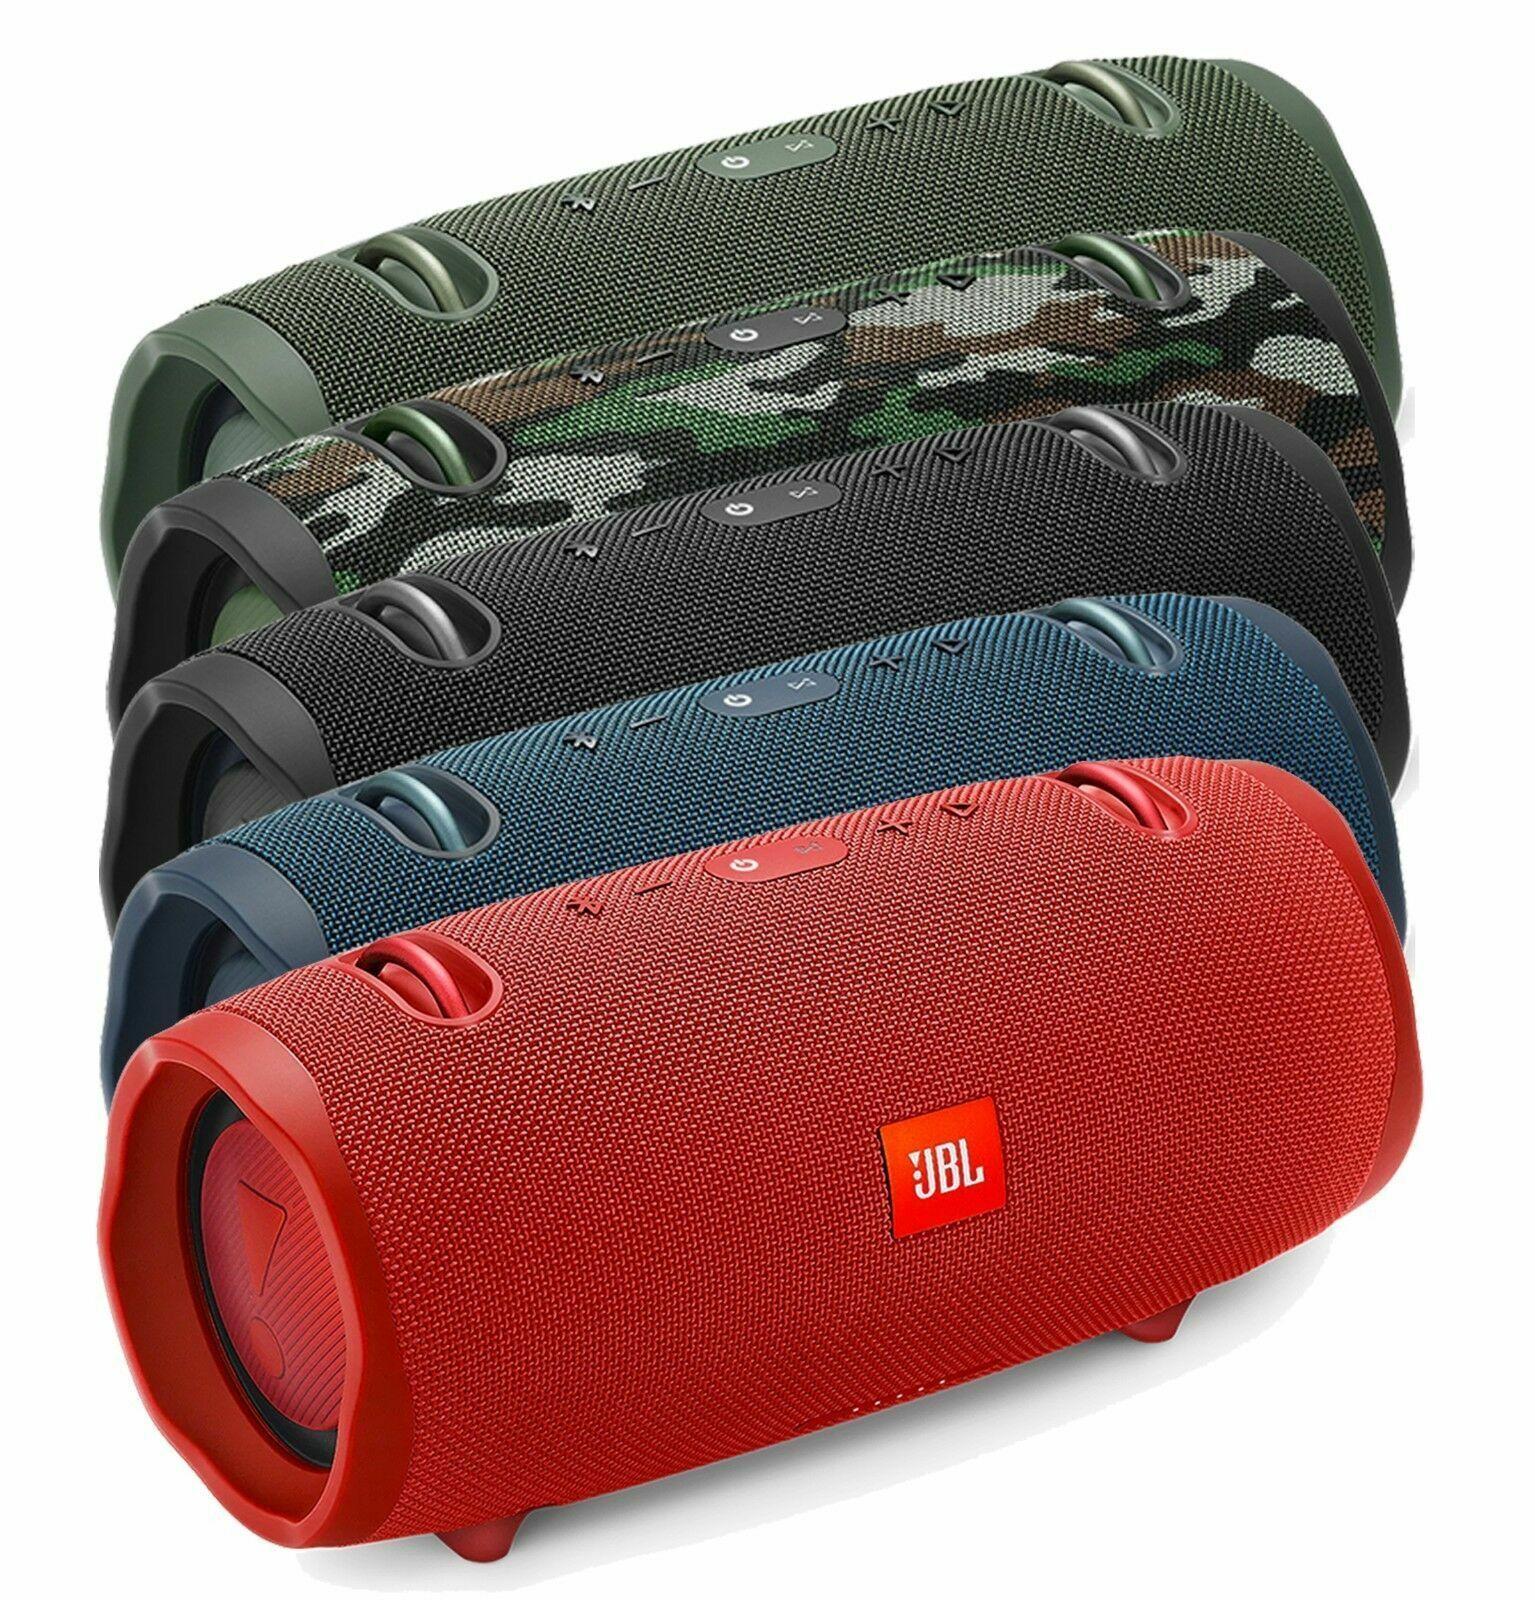 JBL Xtreme2 Wireless Portable Bluetooth Stereo Speaker Black